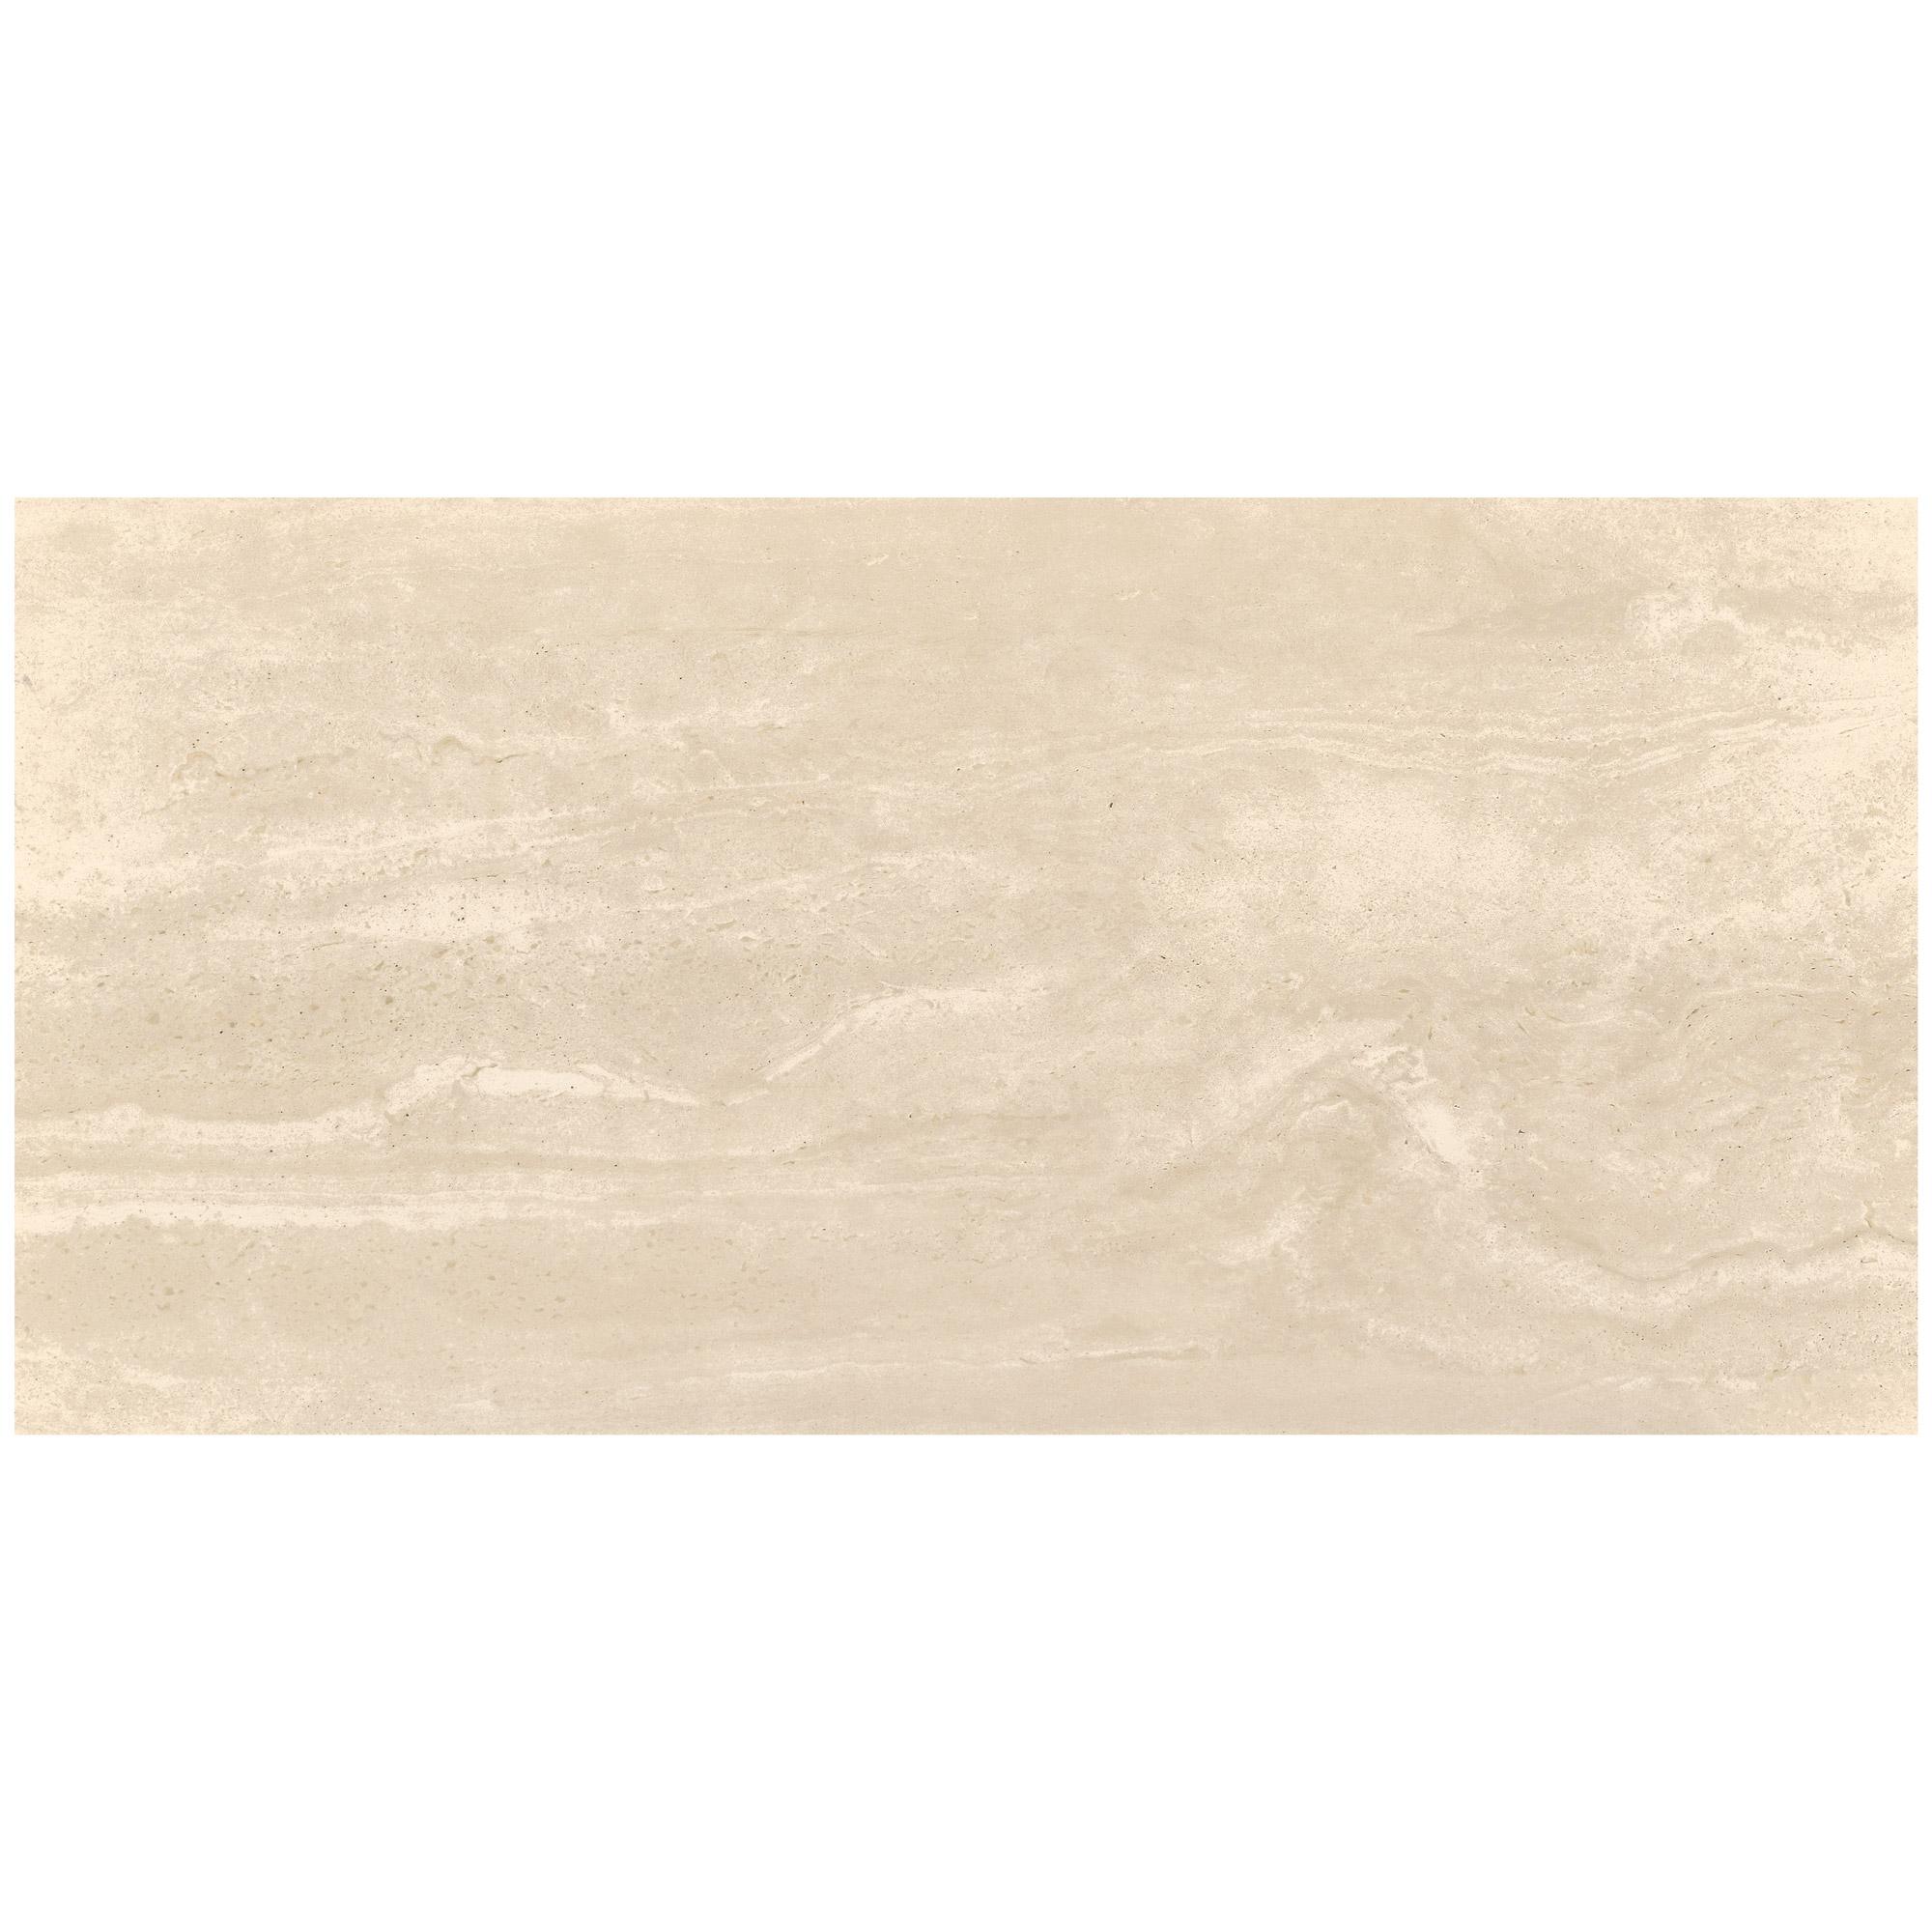 Klinker Coem Reverso Avorio P/R 30×60 cm